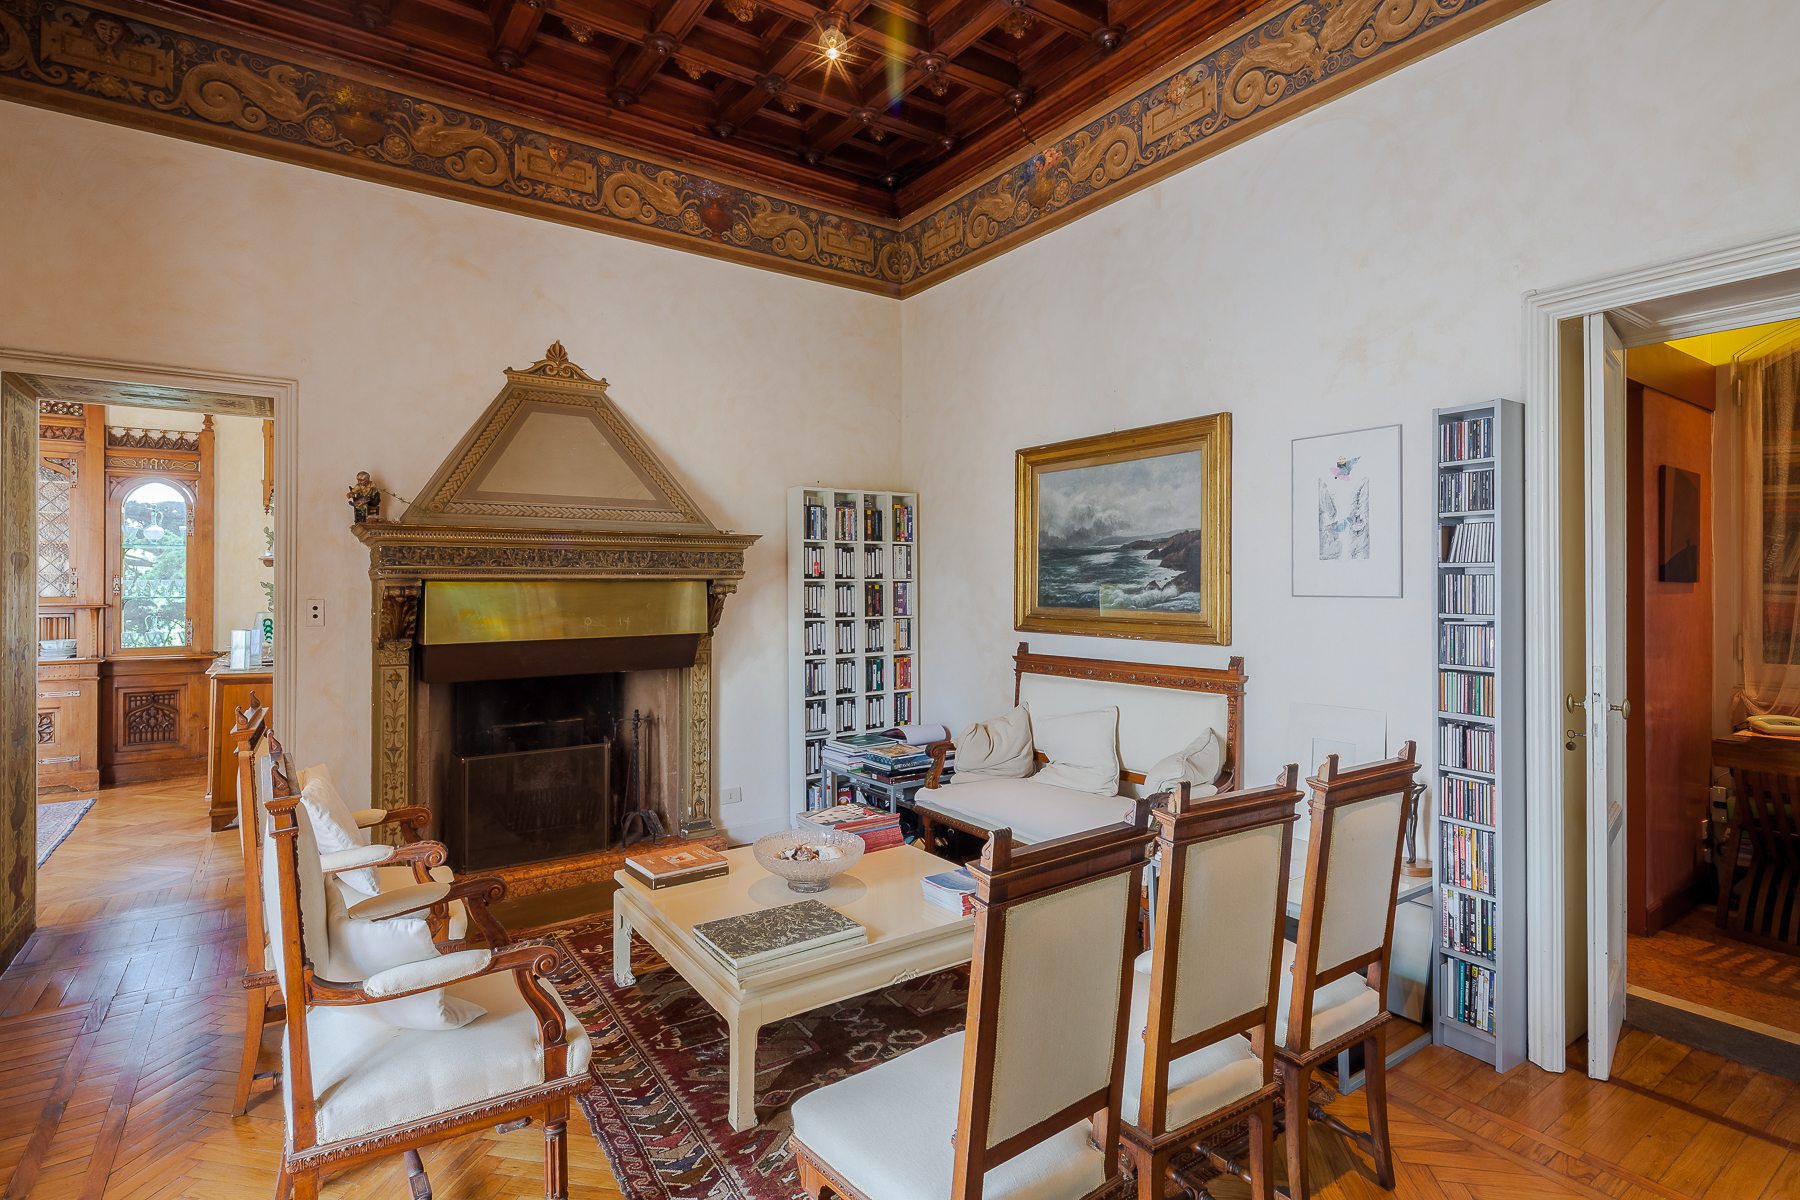 Villa in Vendita a Varese: 5 locali, 375 mq - Foto 7